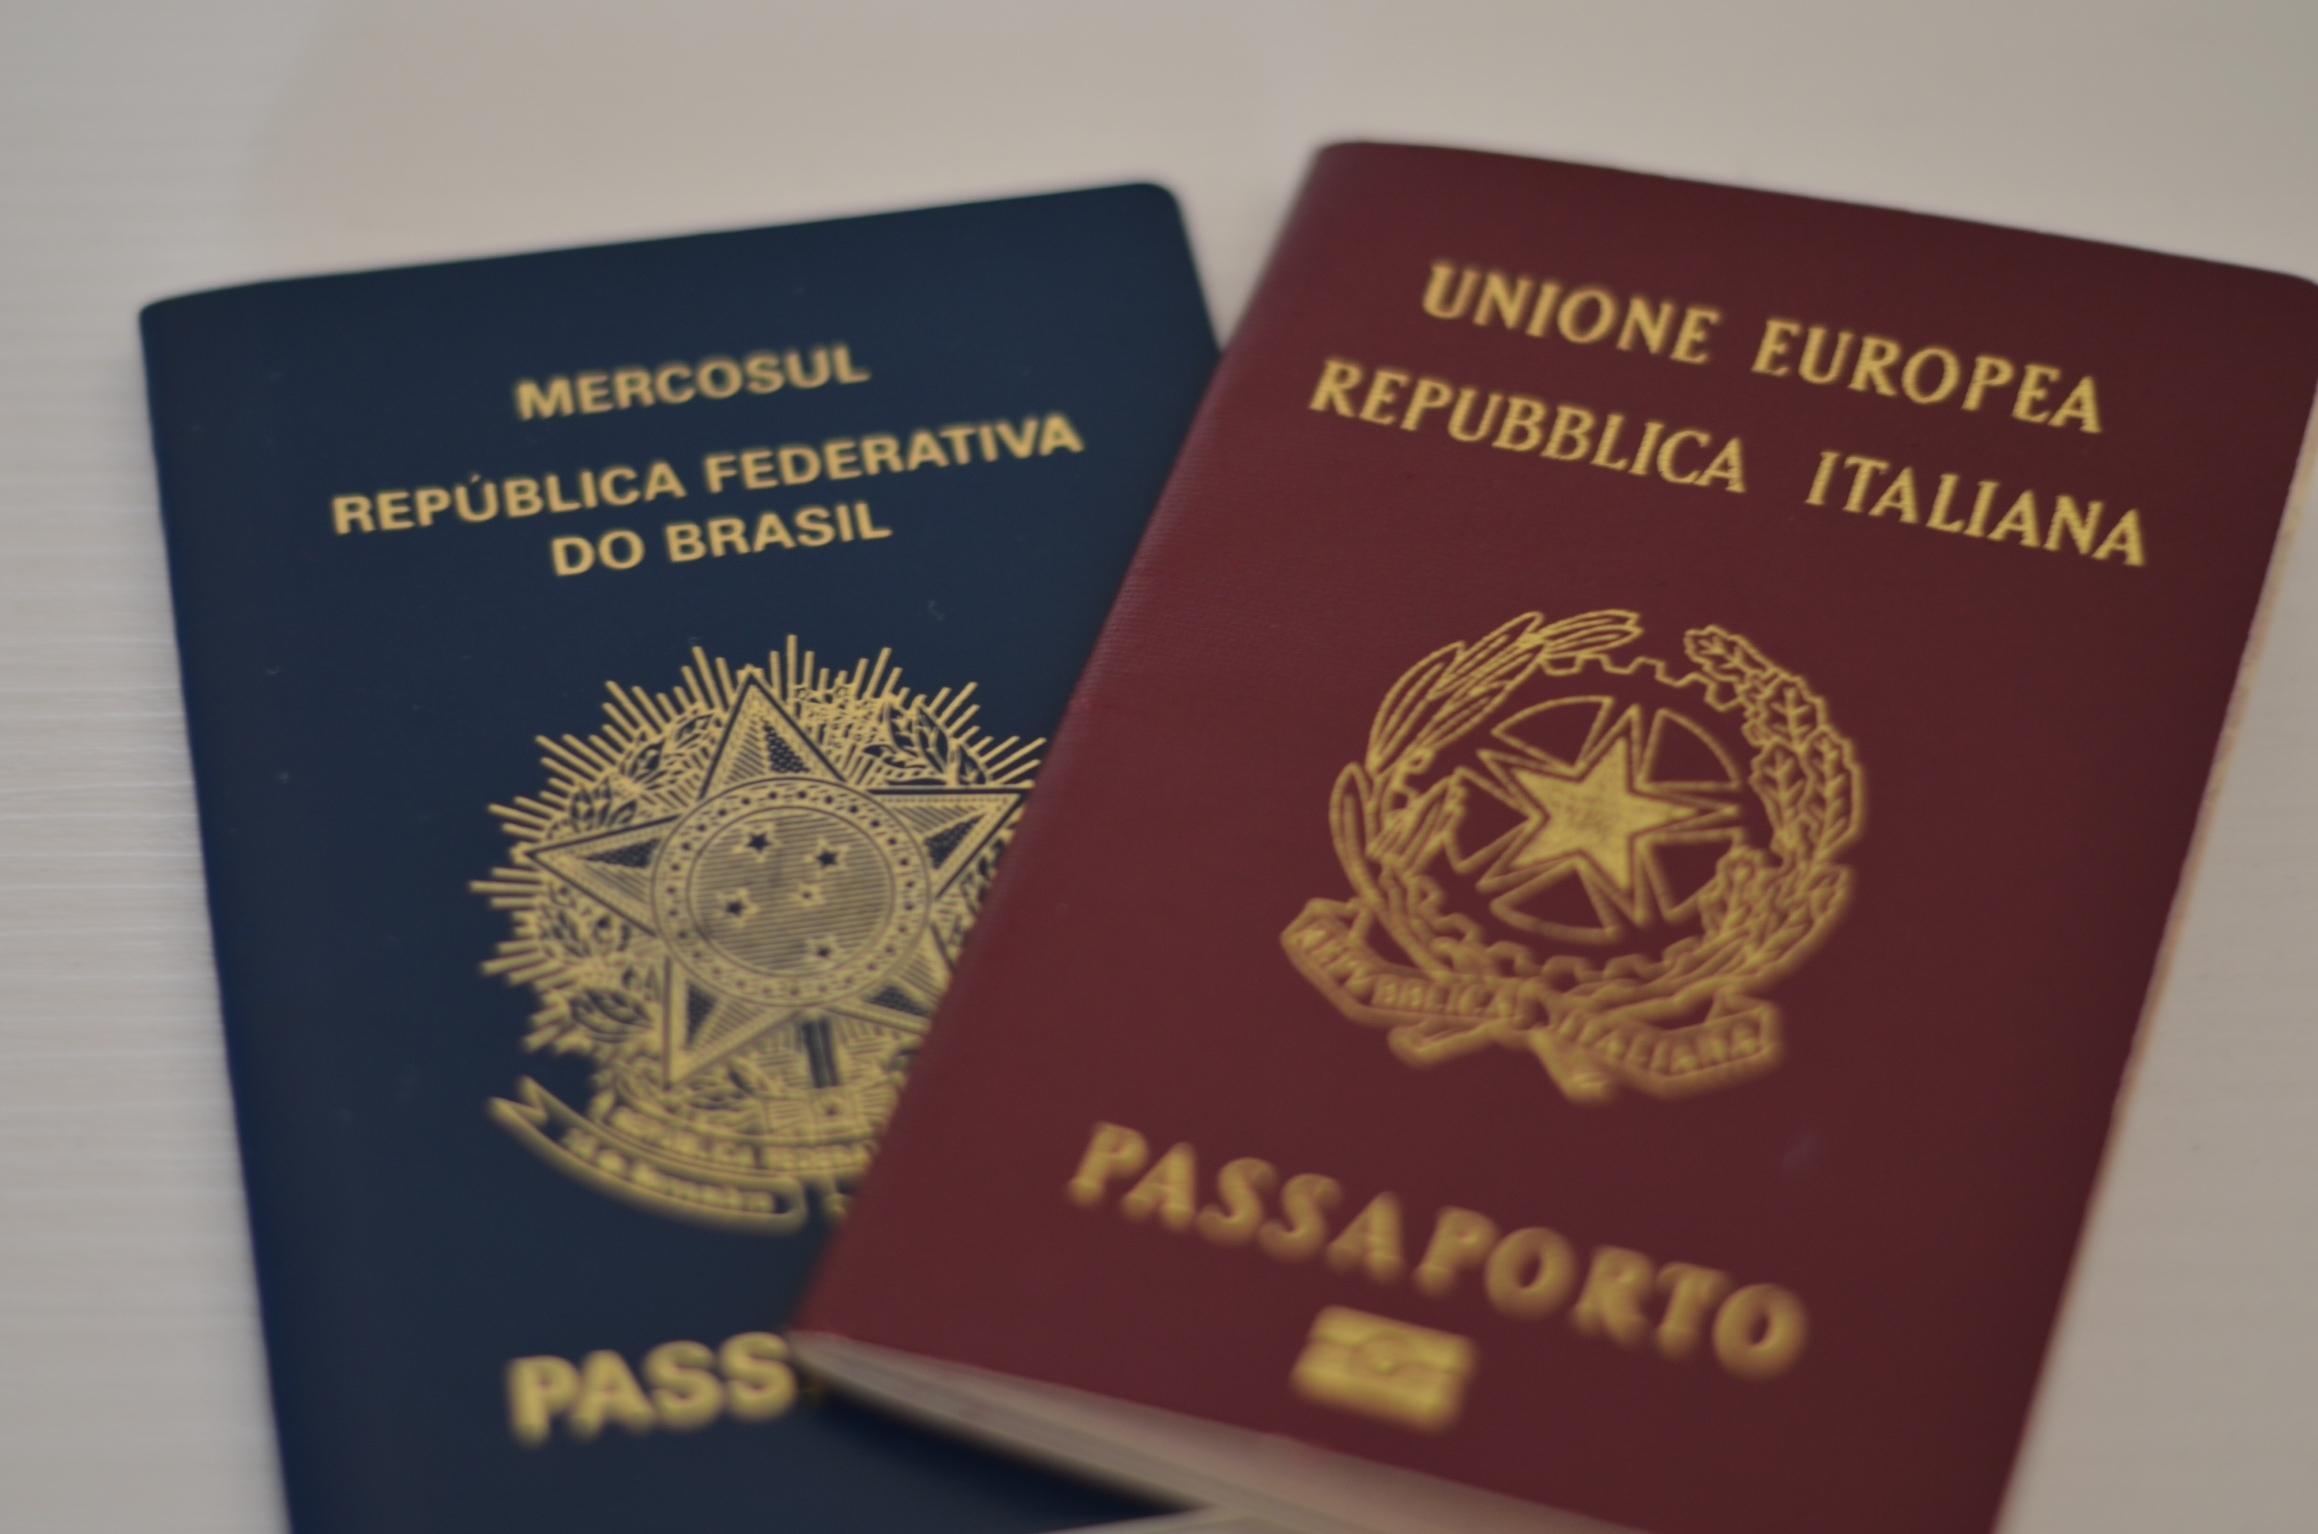 Cidadania europeia, dupla cidadania